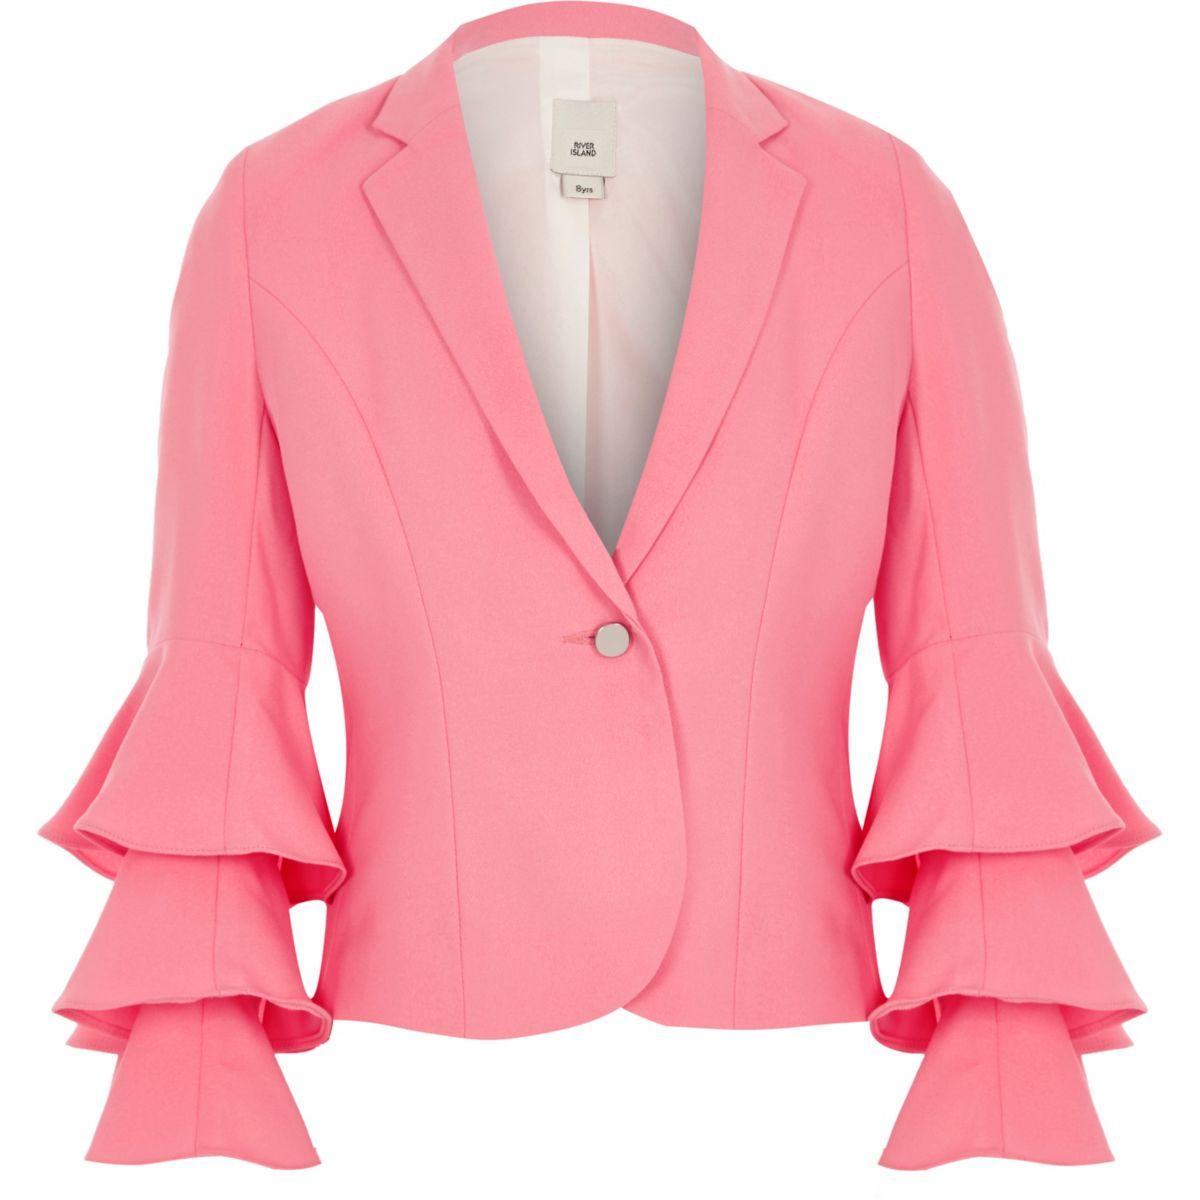 Girls bright pink frill sleeve blazer